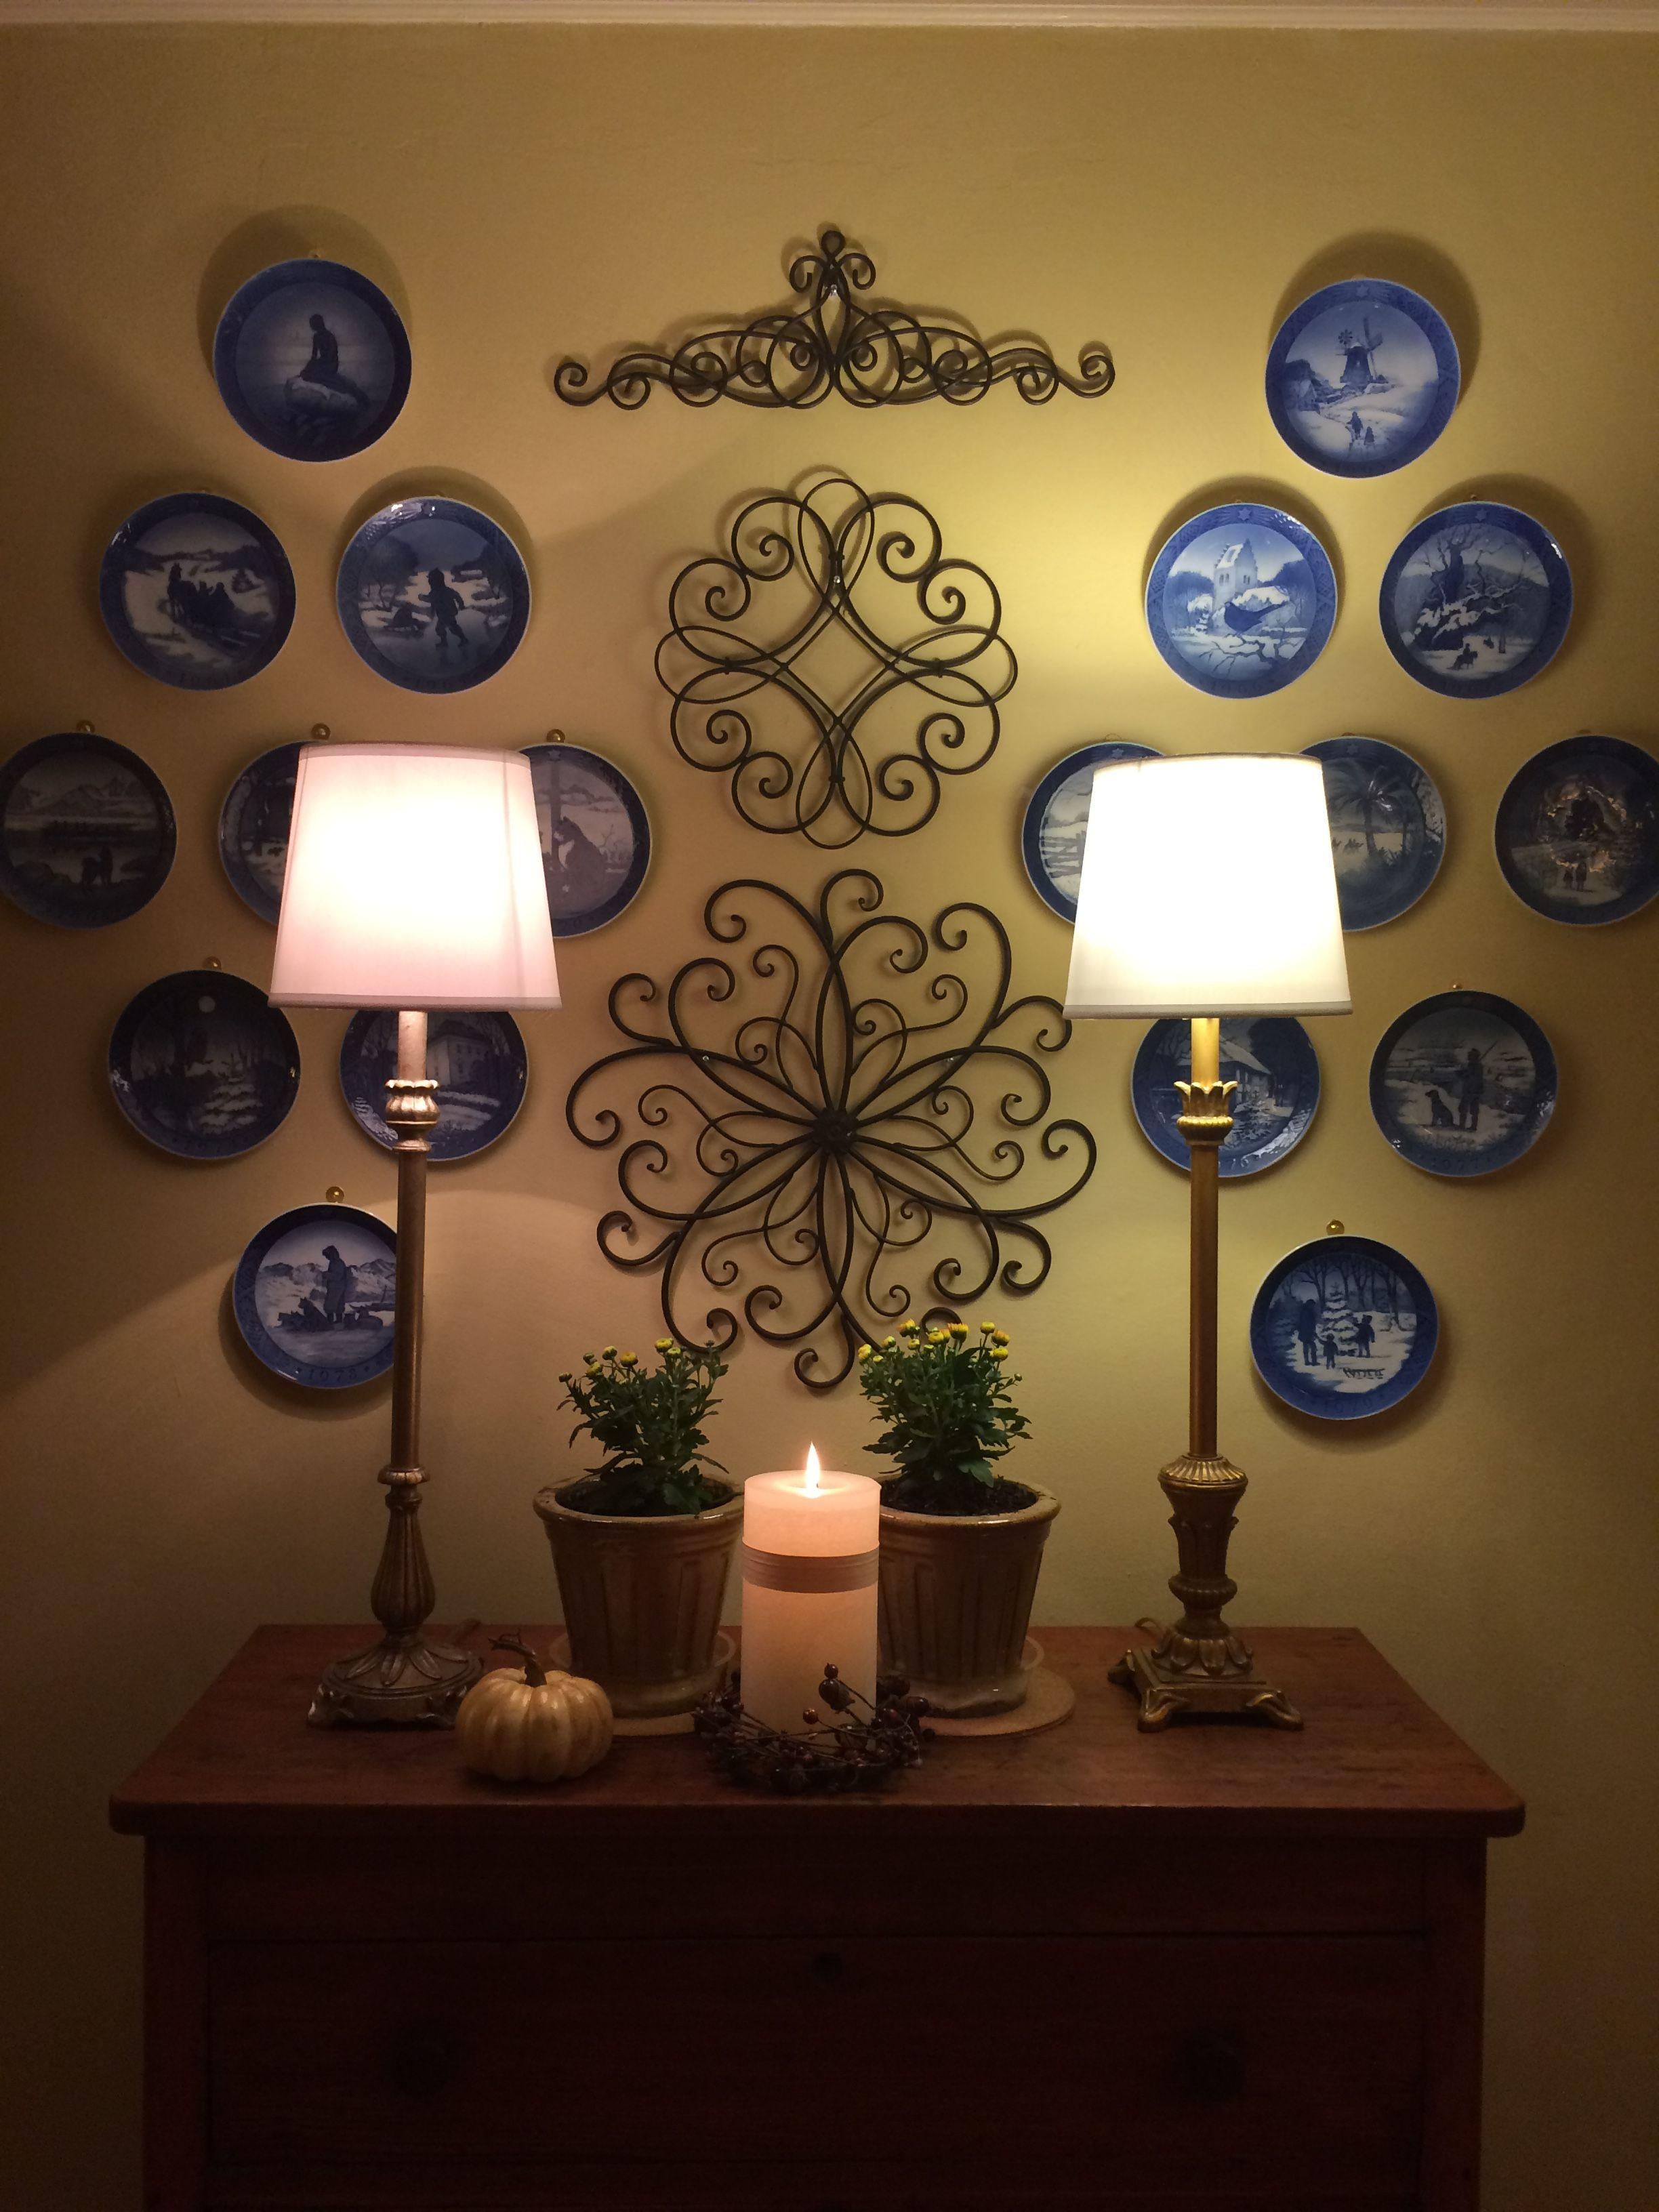 Royal Copenhagen Christmas Plates Displayed Design Ideas